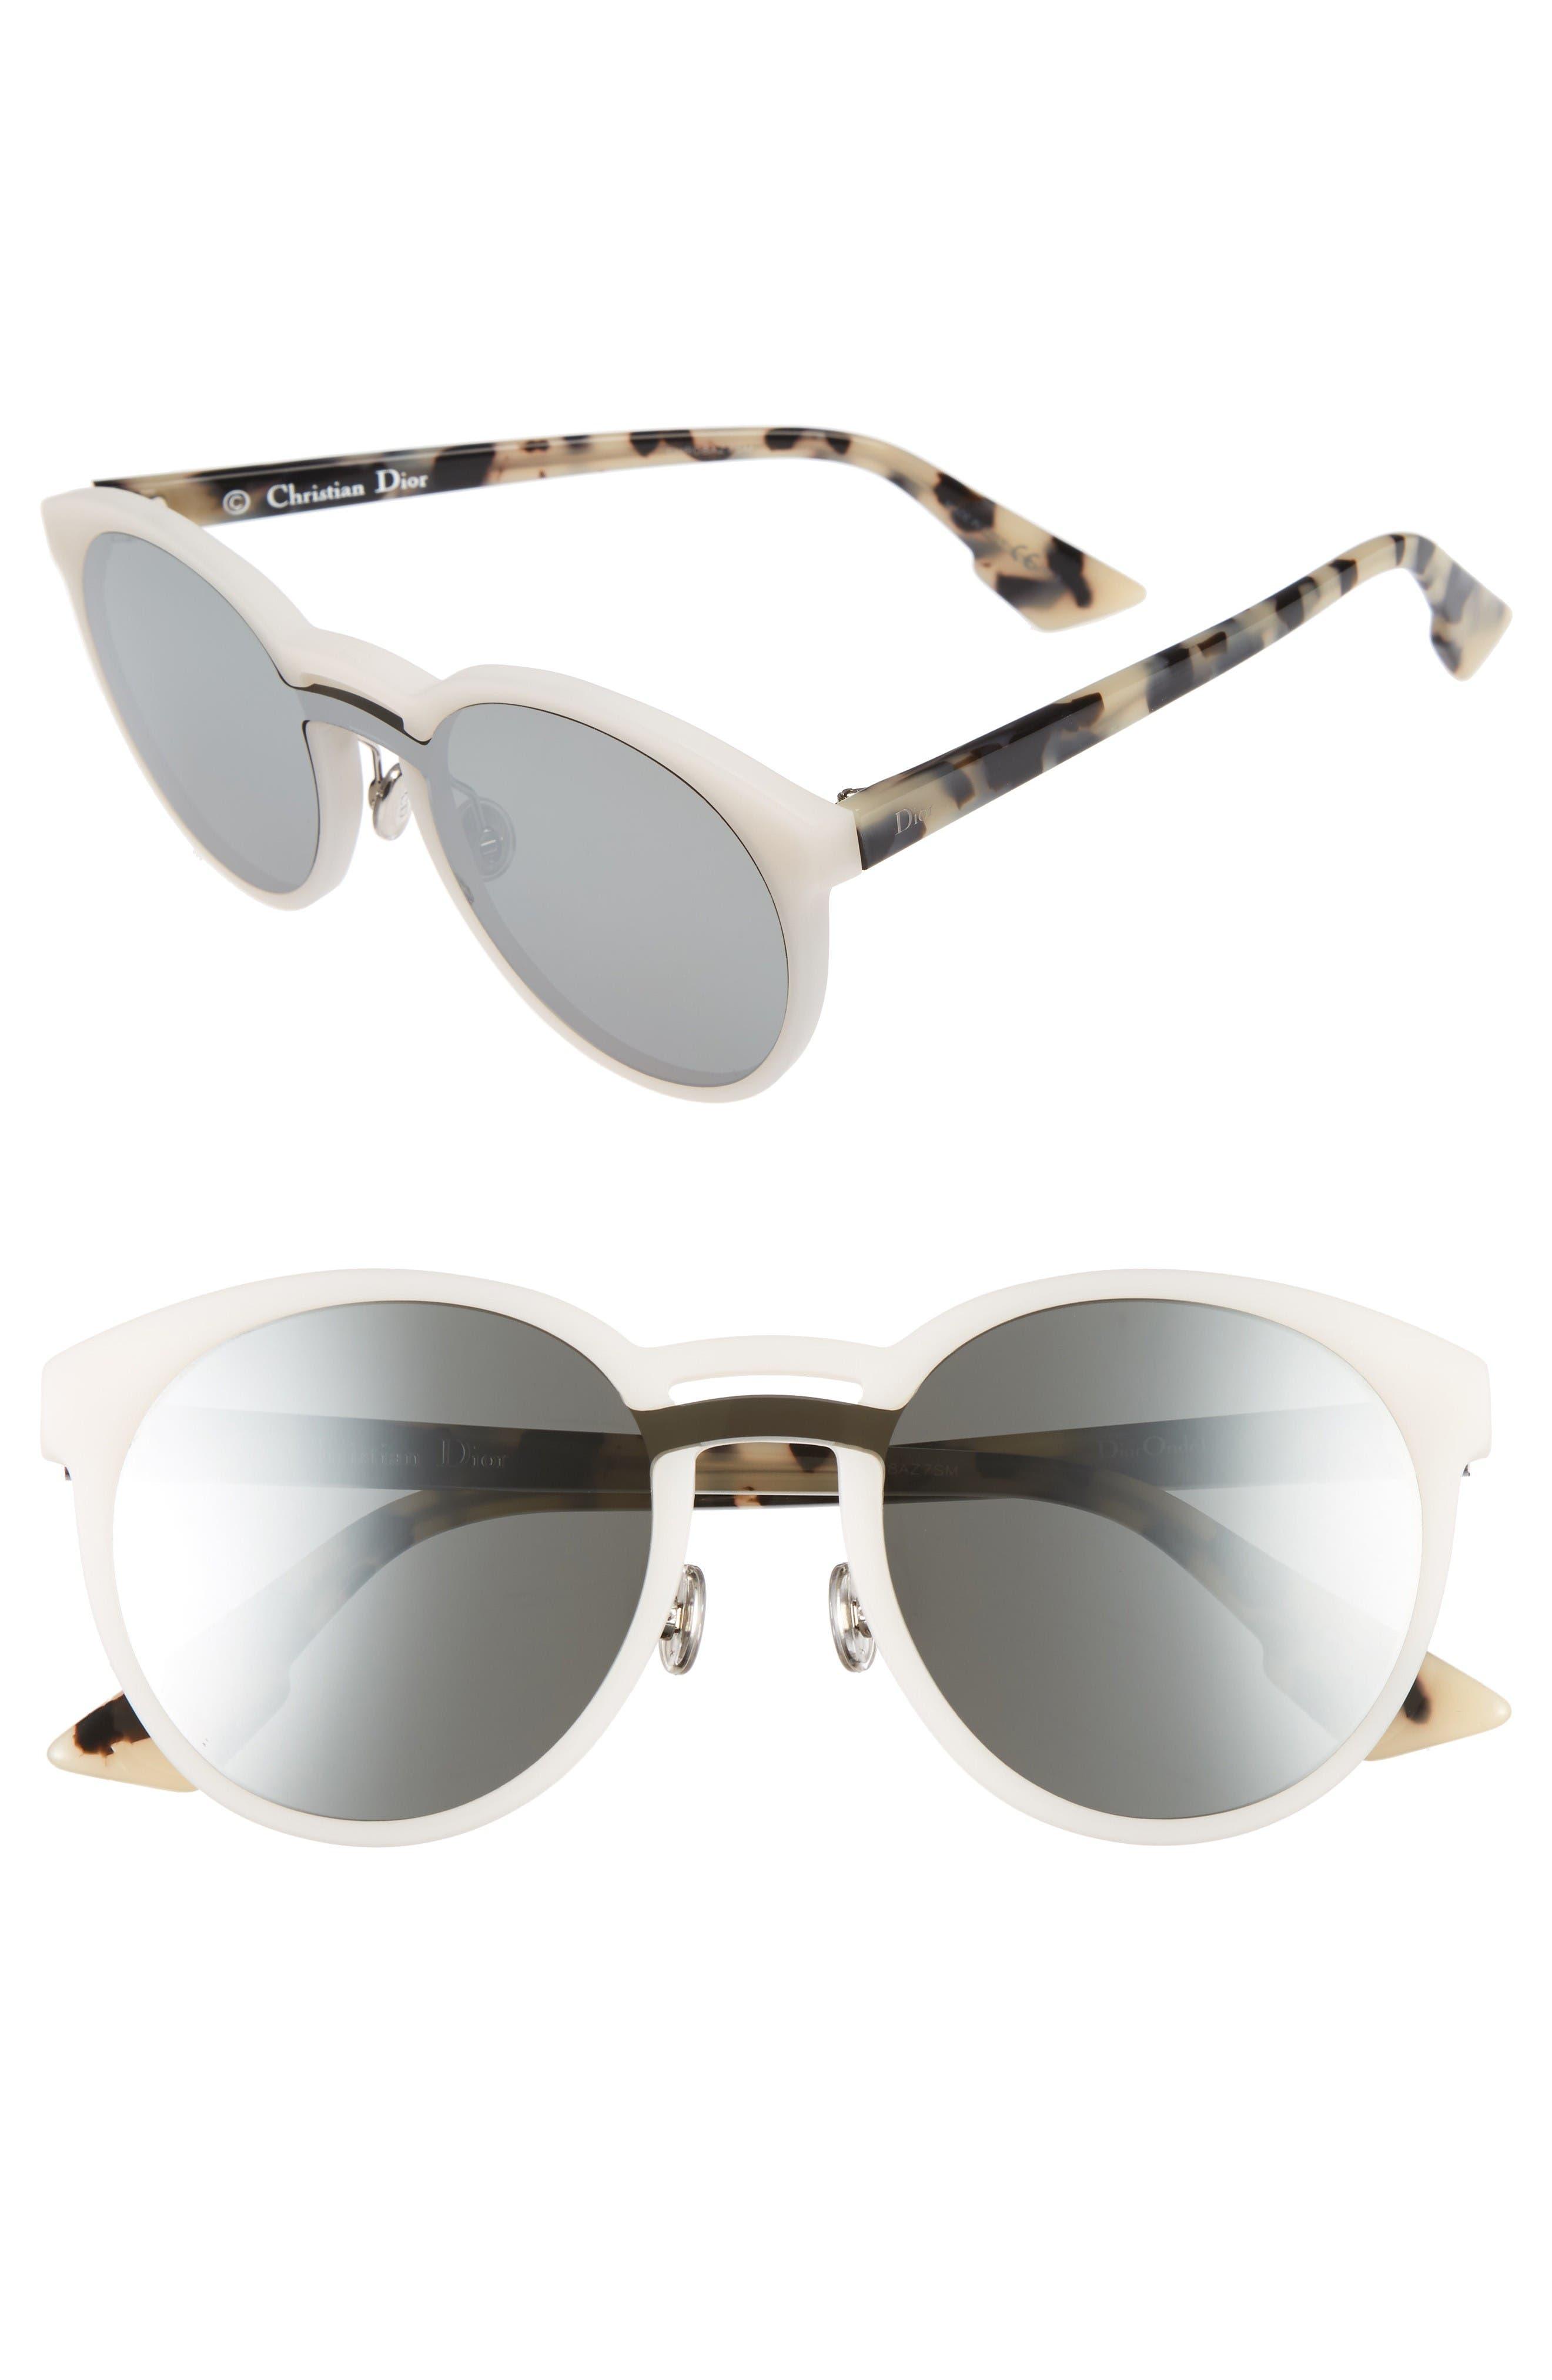 DIOR Onde 1 50mm Round Sunglasses